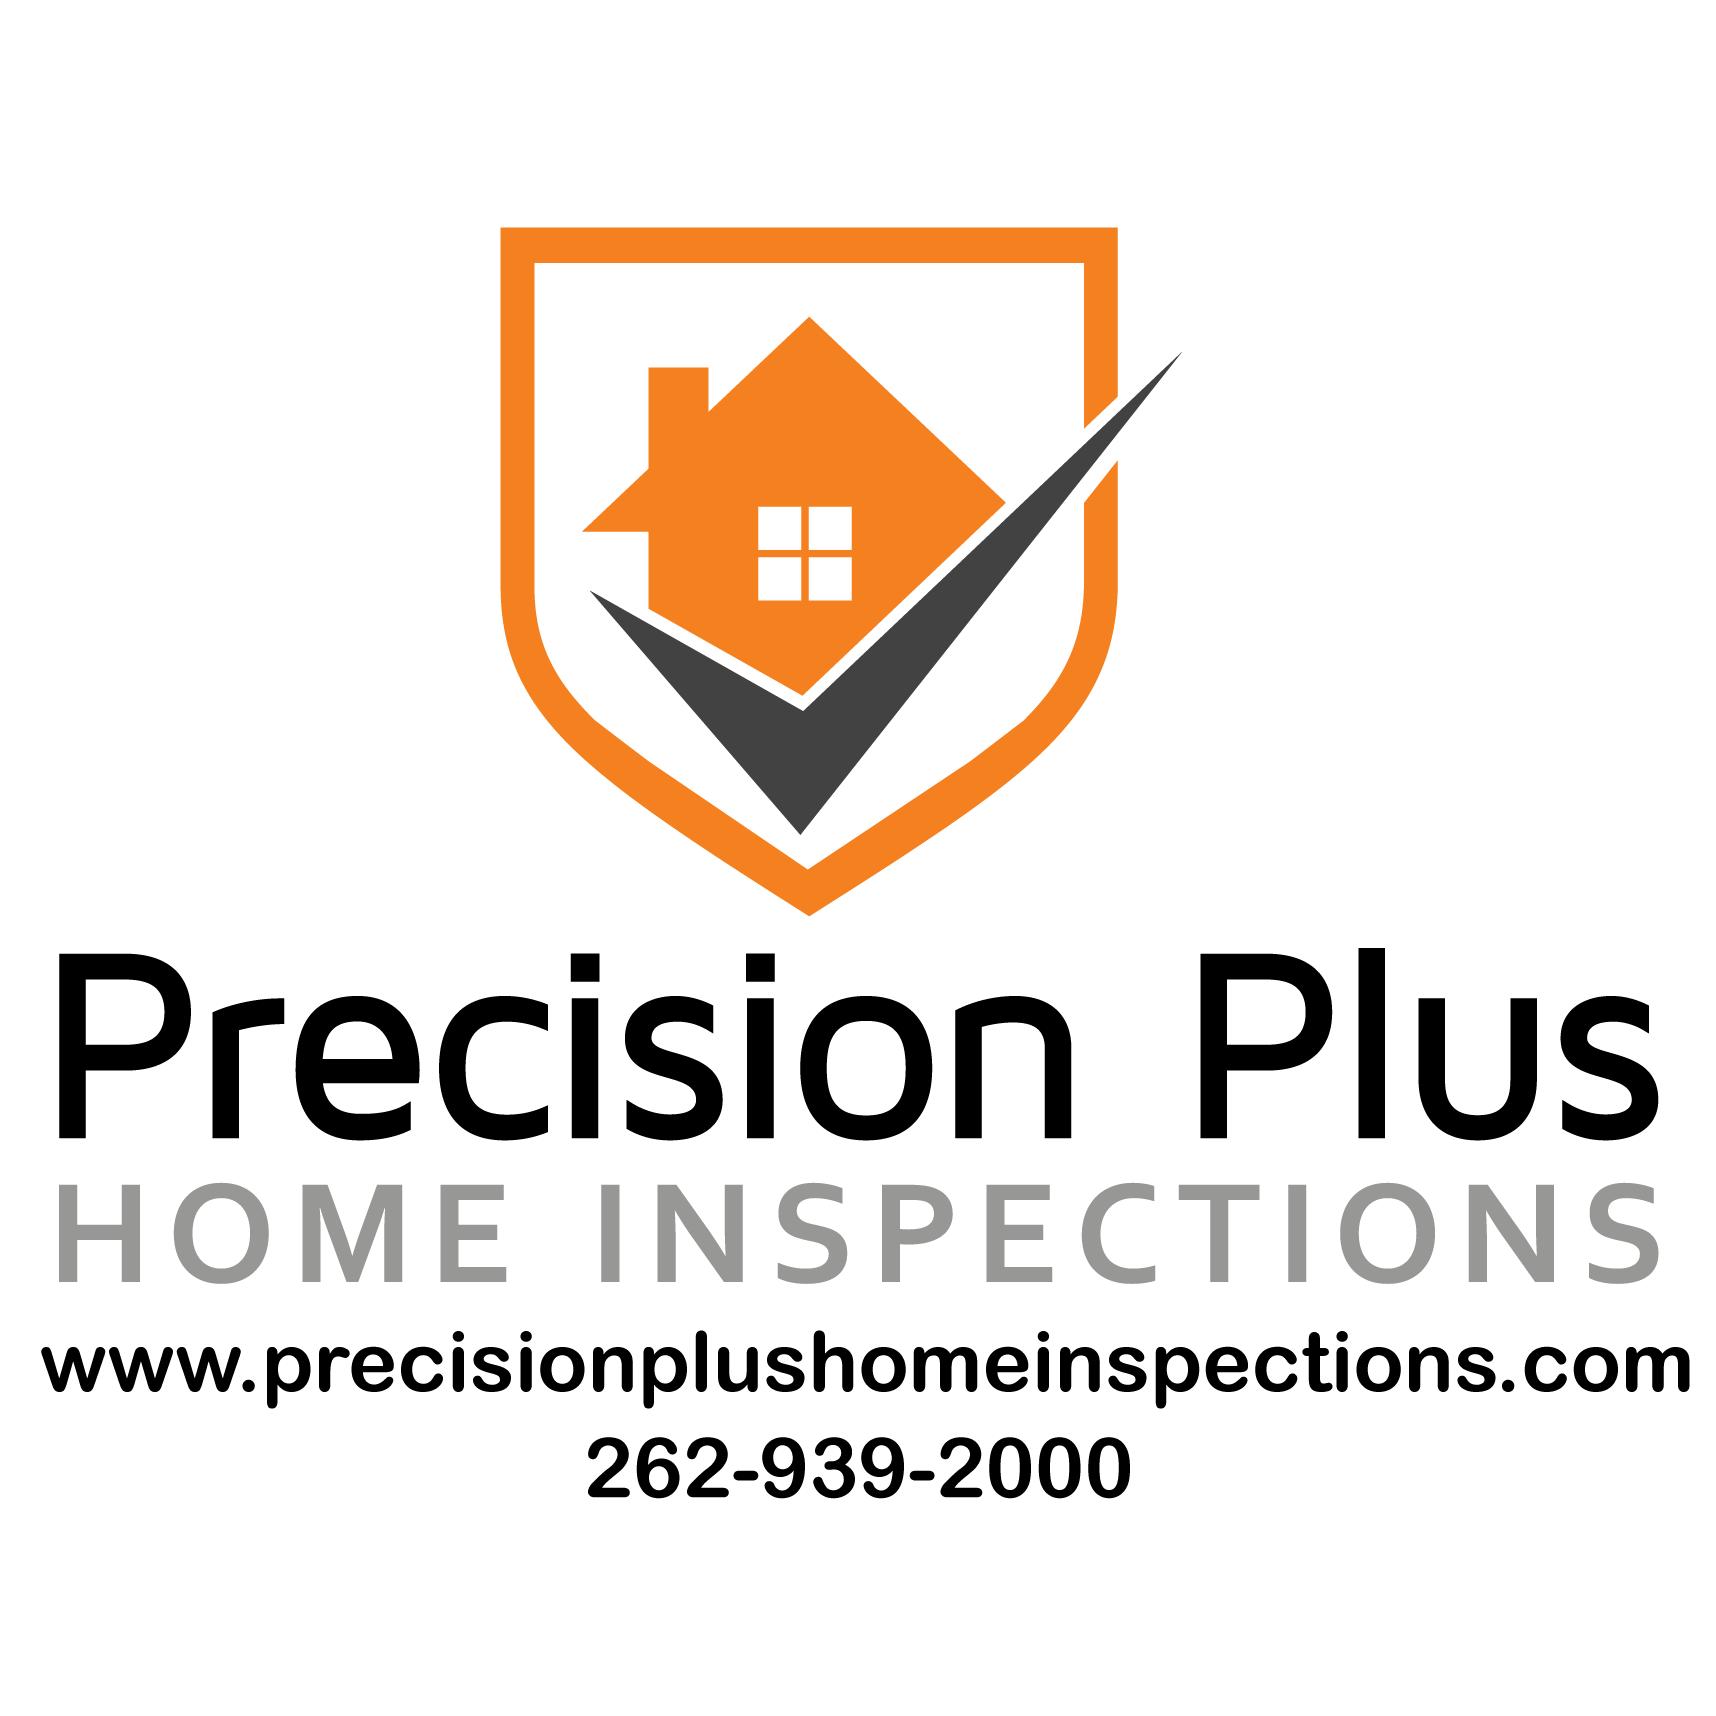 Precision Plus Home Inspections LLC image 0